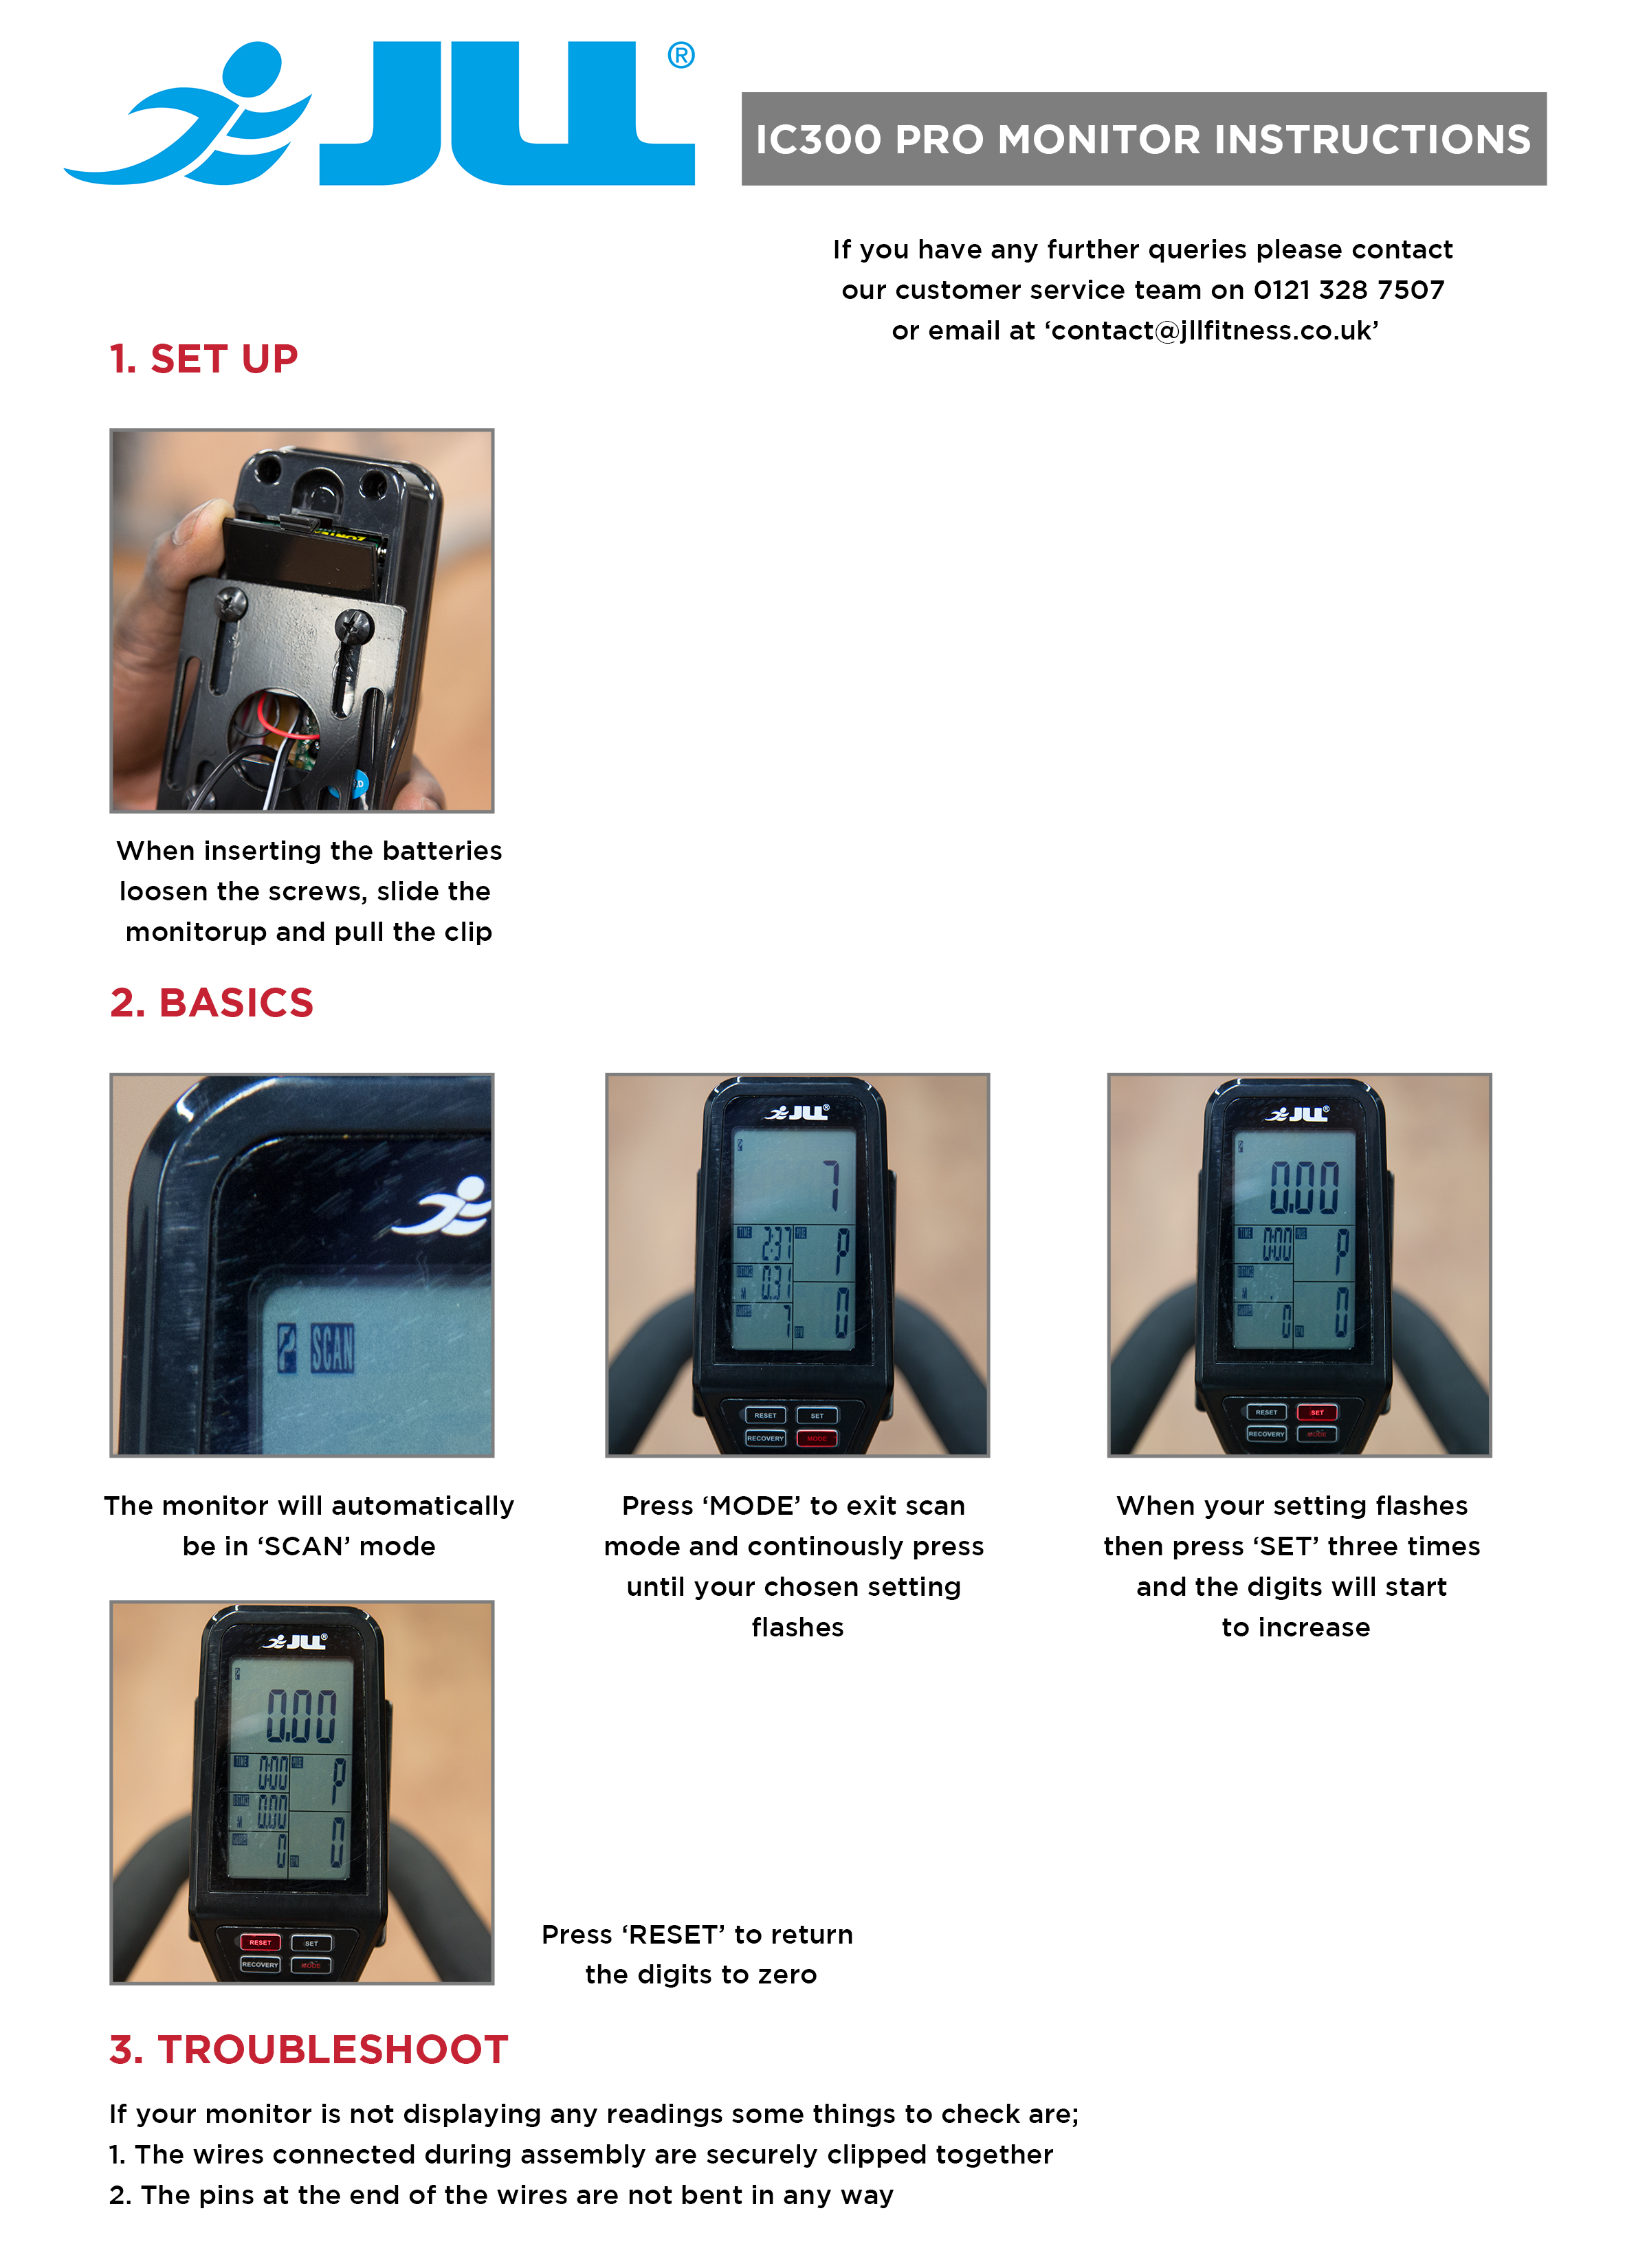 IC300 PRO Monitor Instructions